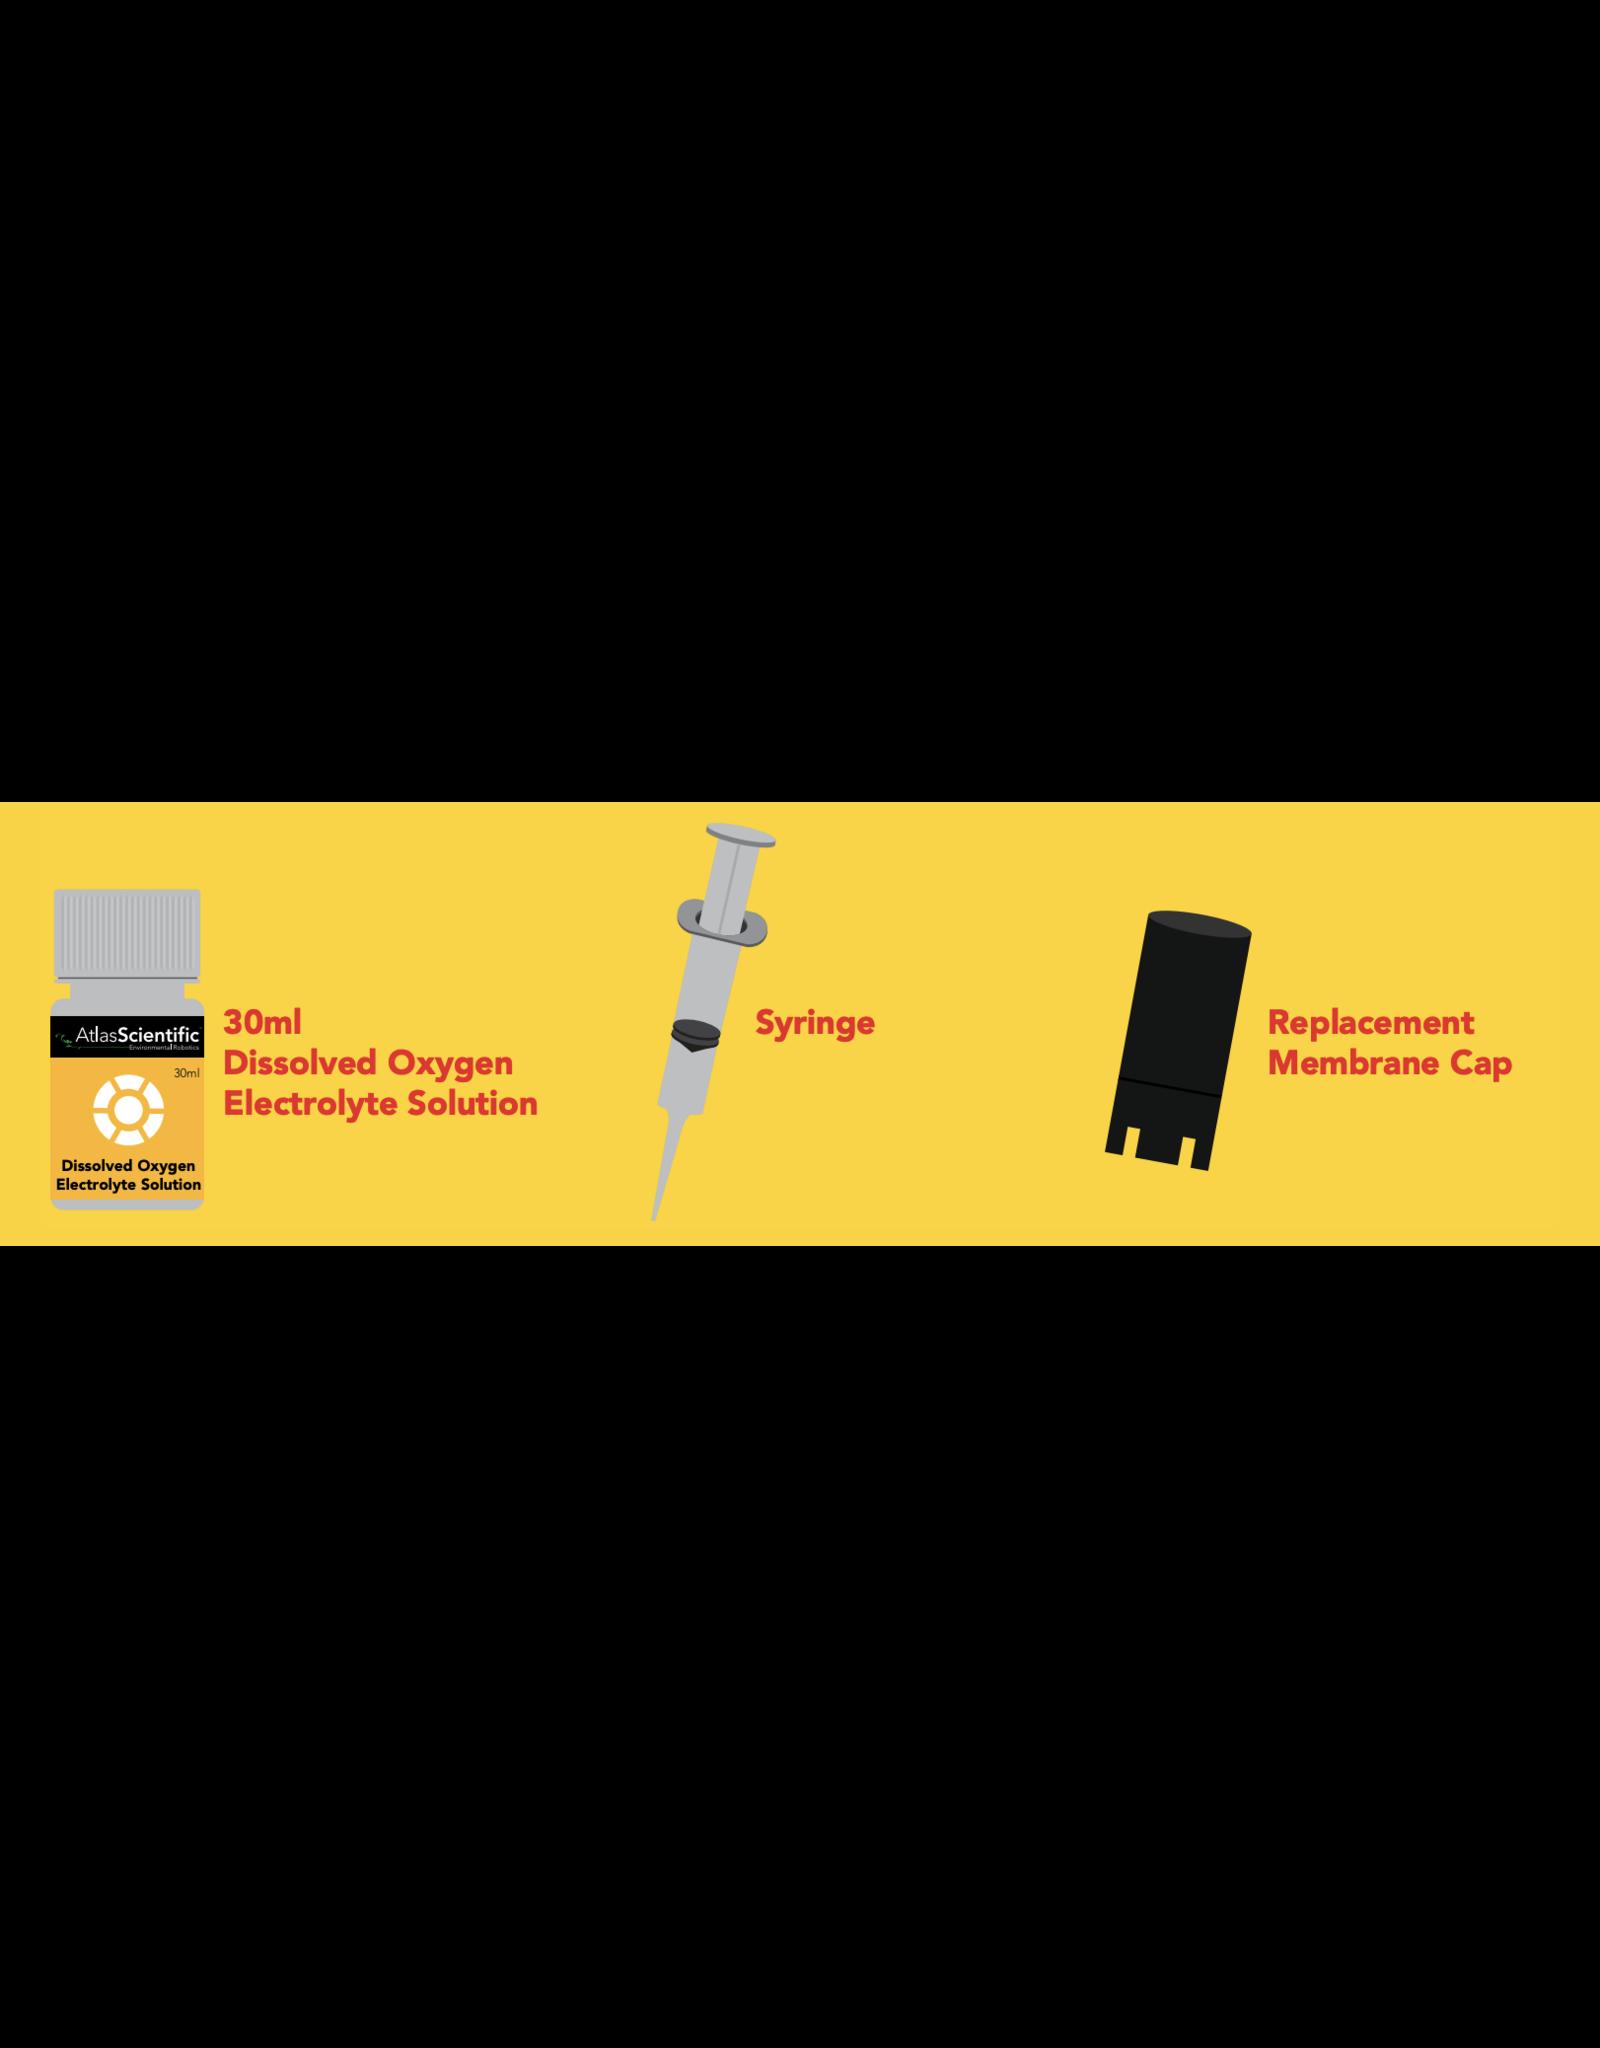 Atlas Scientific Dissolved Oxygen Mini Lab Grade Membrane Replacement Kit